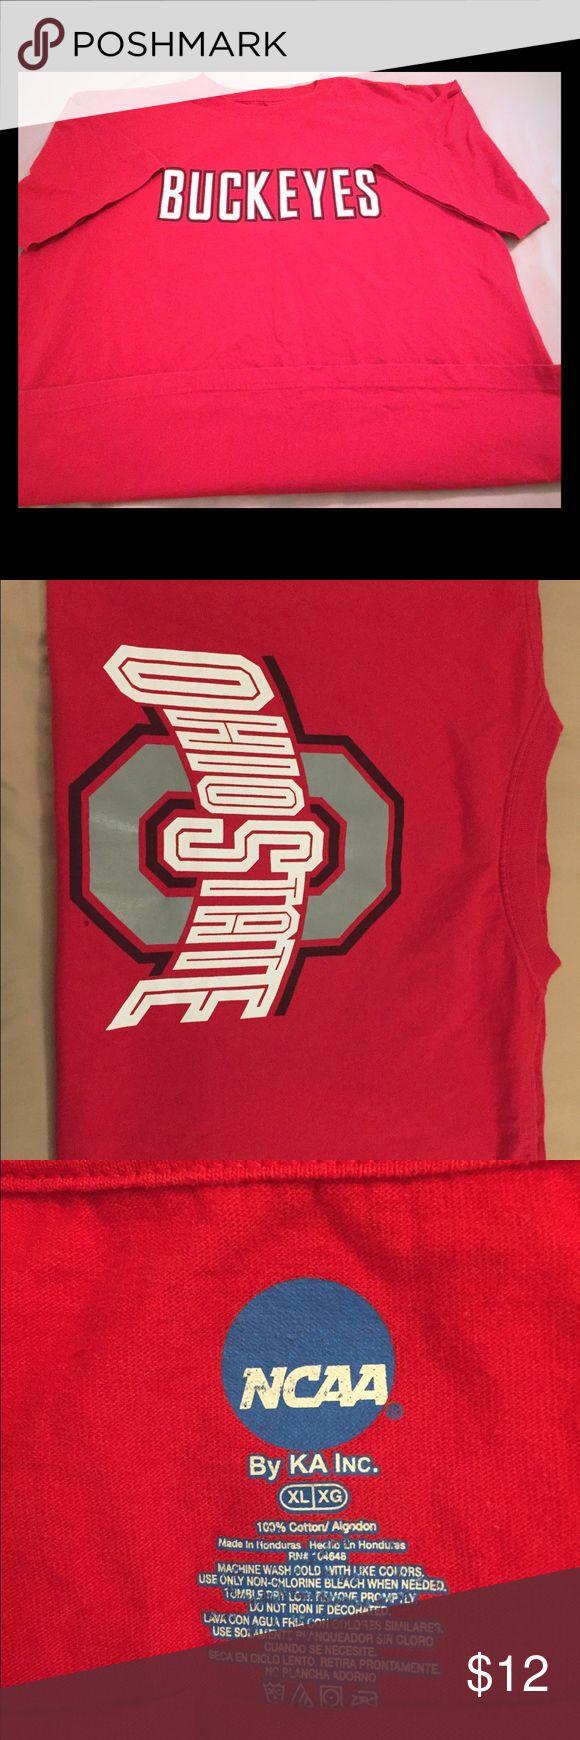 Men's NCAA Ohio State Buckeyes Red T-Shirt XL NCAA / Ohio State Buckeyes / X-L / Good condition! NCAA Shirts Tees - Short Sleeve